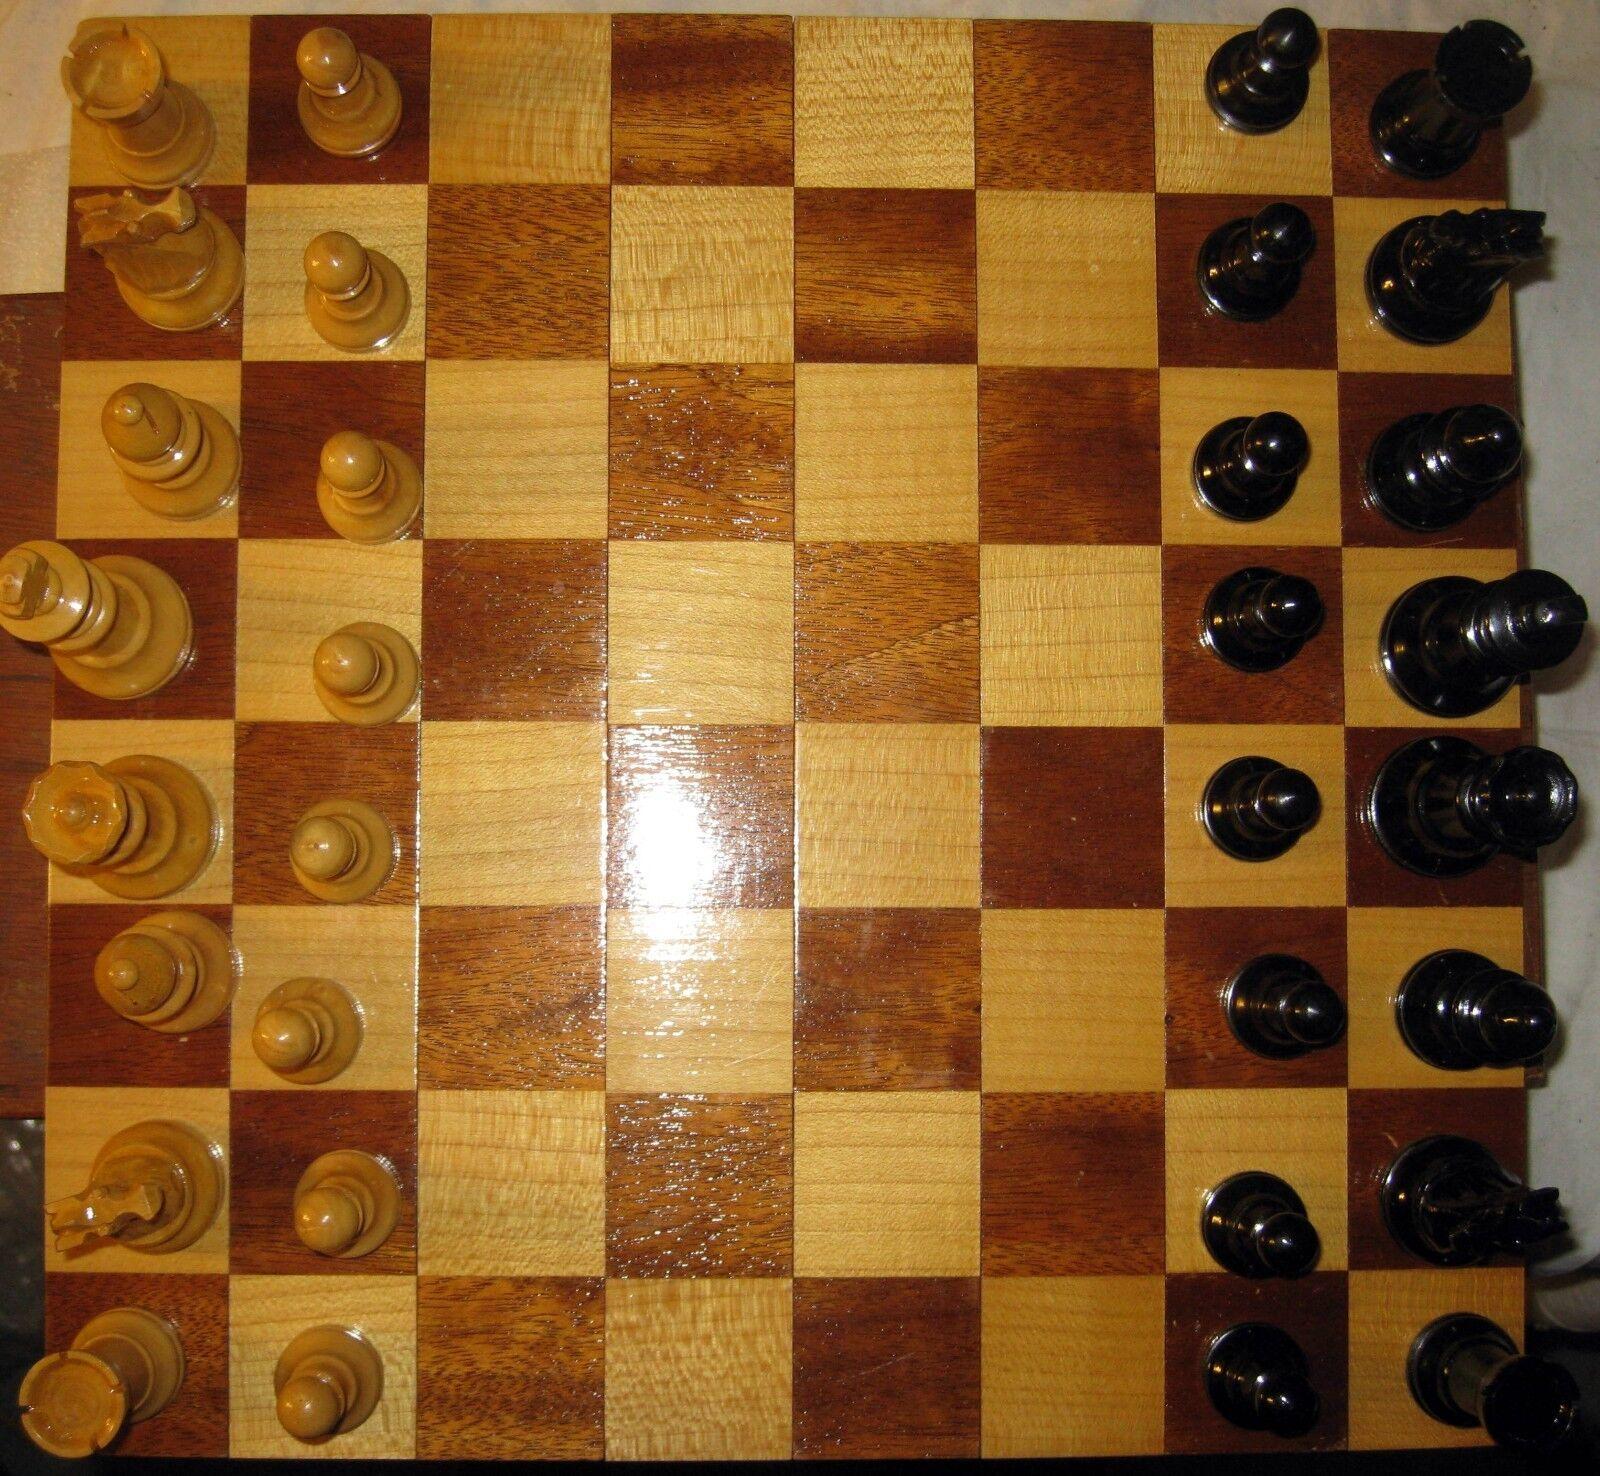 Wooden Wooden Wooden Chess Set in Wooden Case with wooden folding Board - RARE f3f6aa